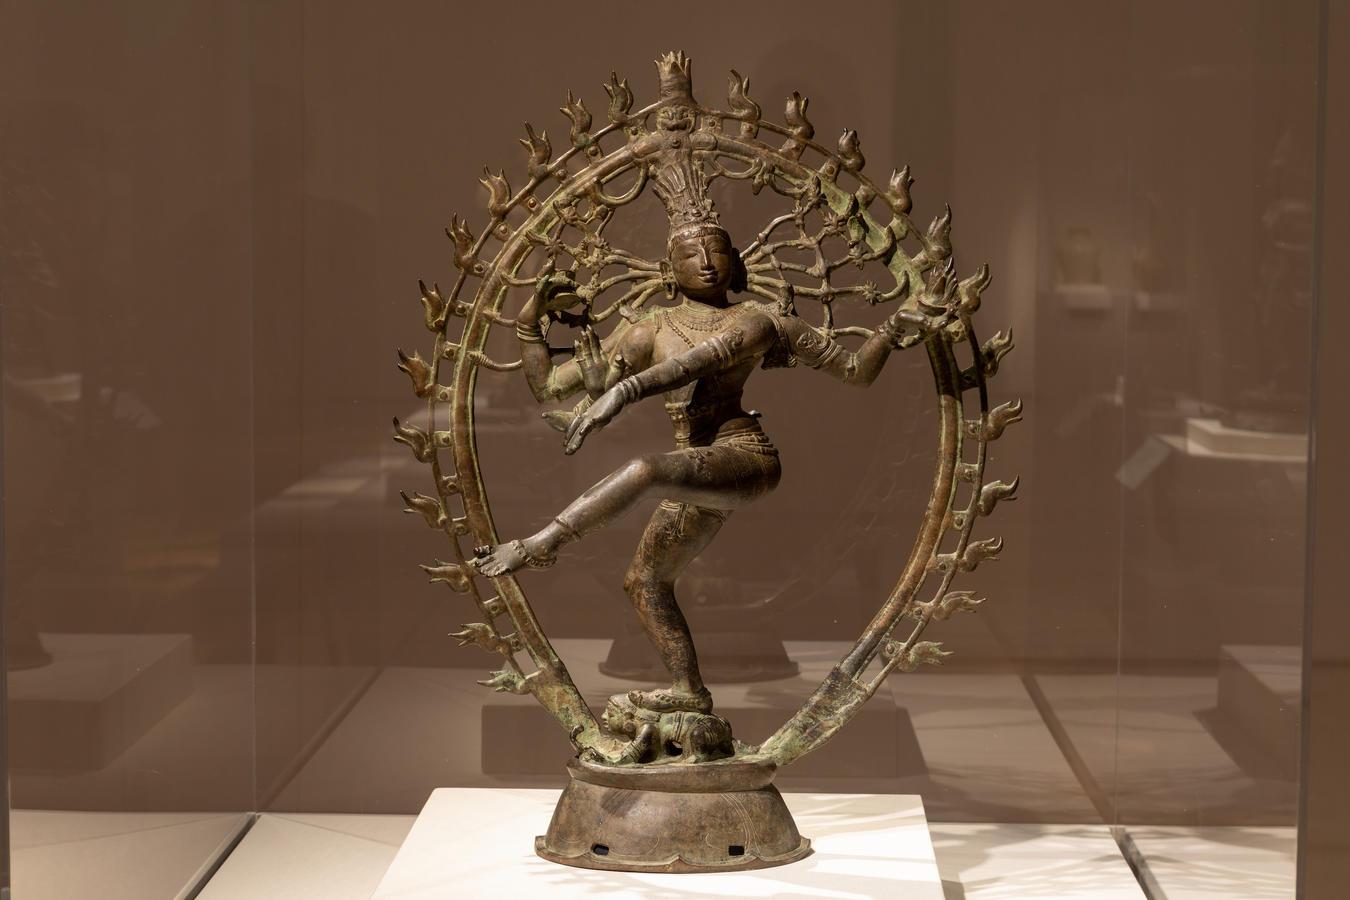 Shiva Nataraja (Shiva as Lord of the Dance)